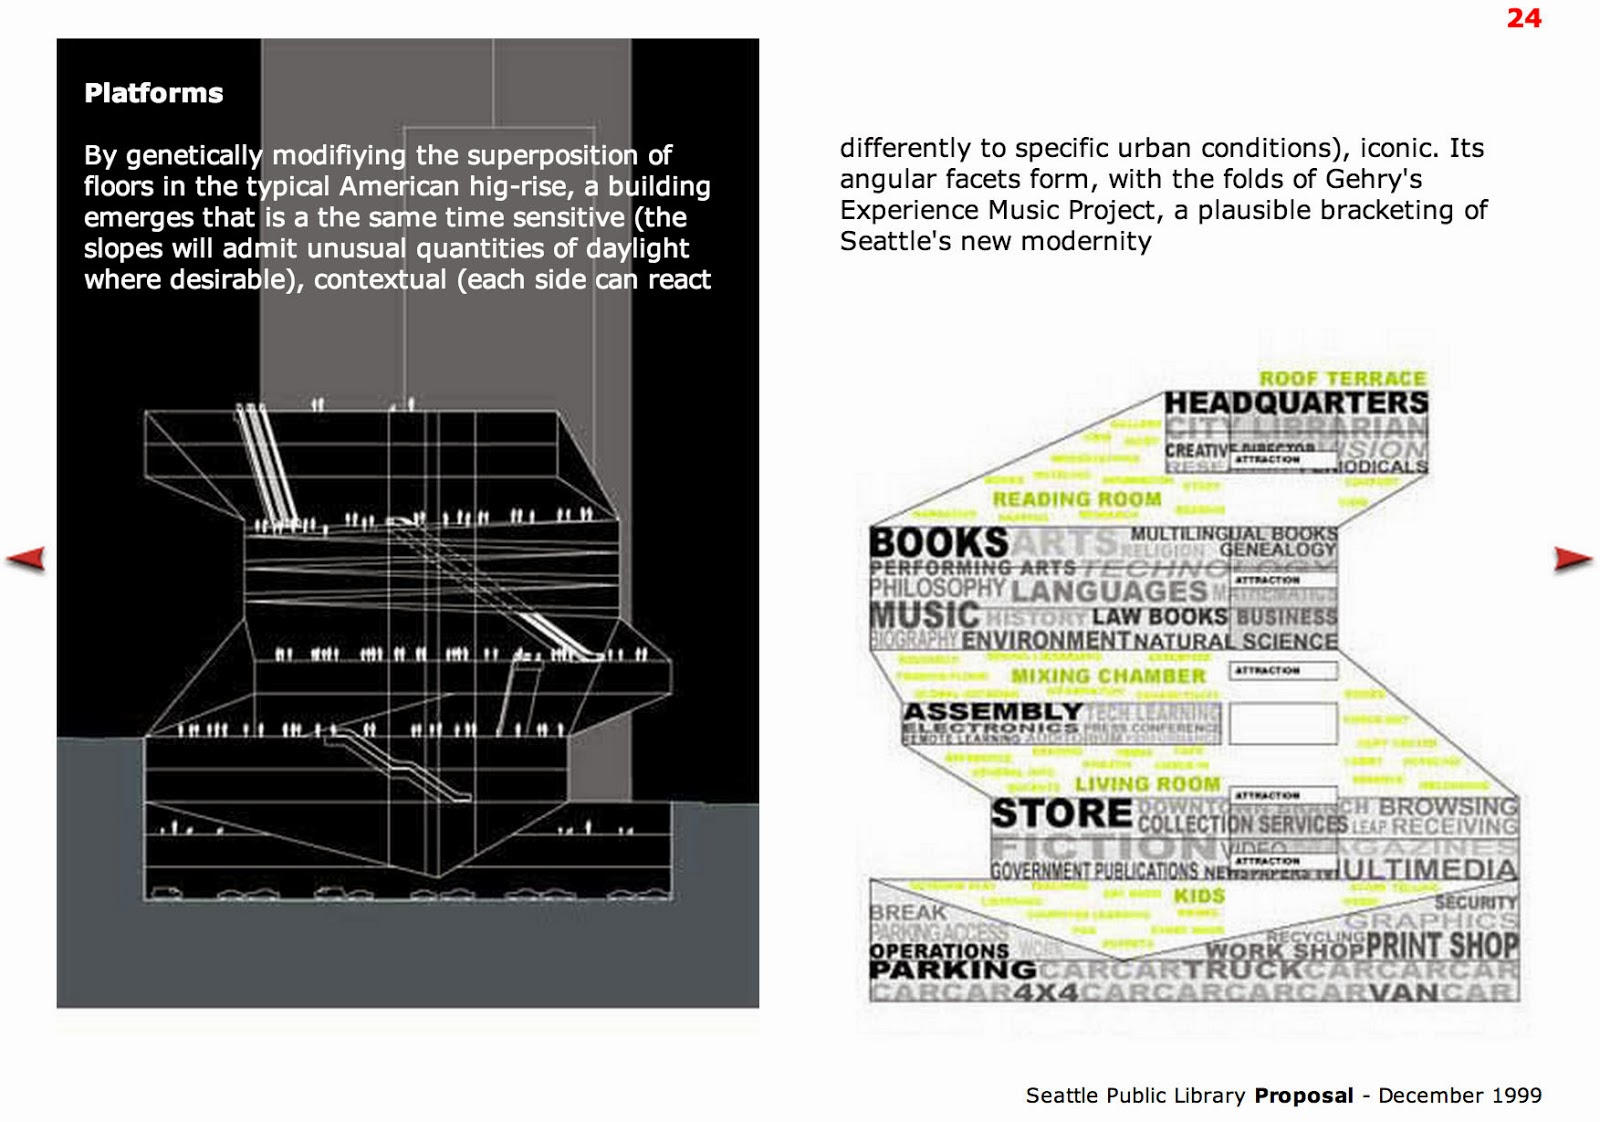 Uncommonplotfall2013 Oma Seattle Public Library Proposal